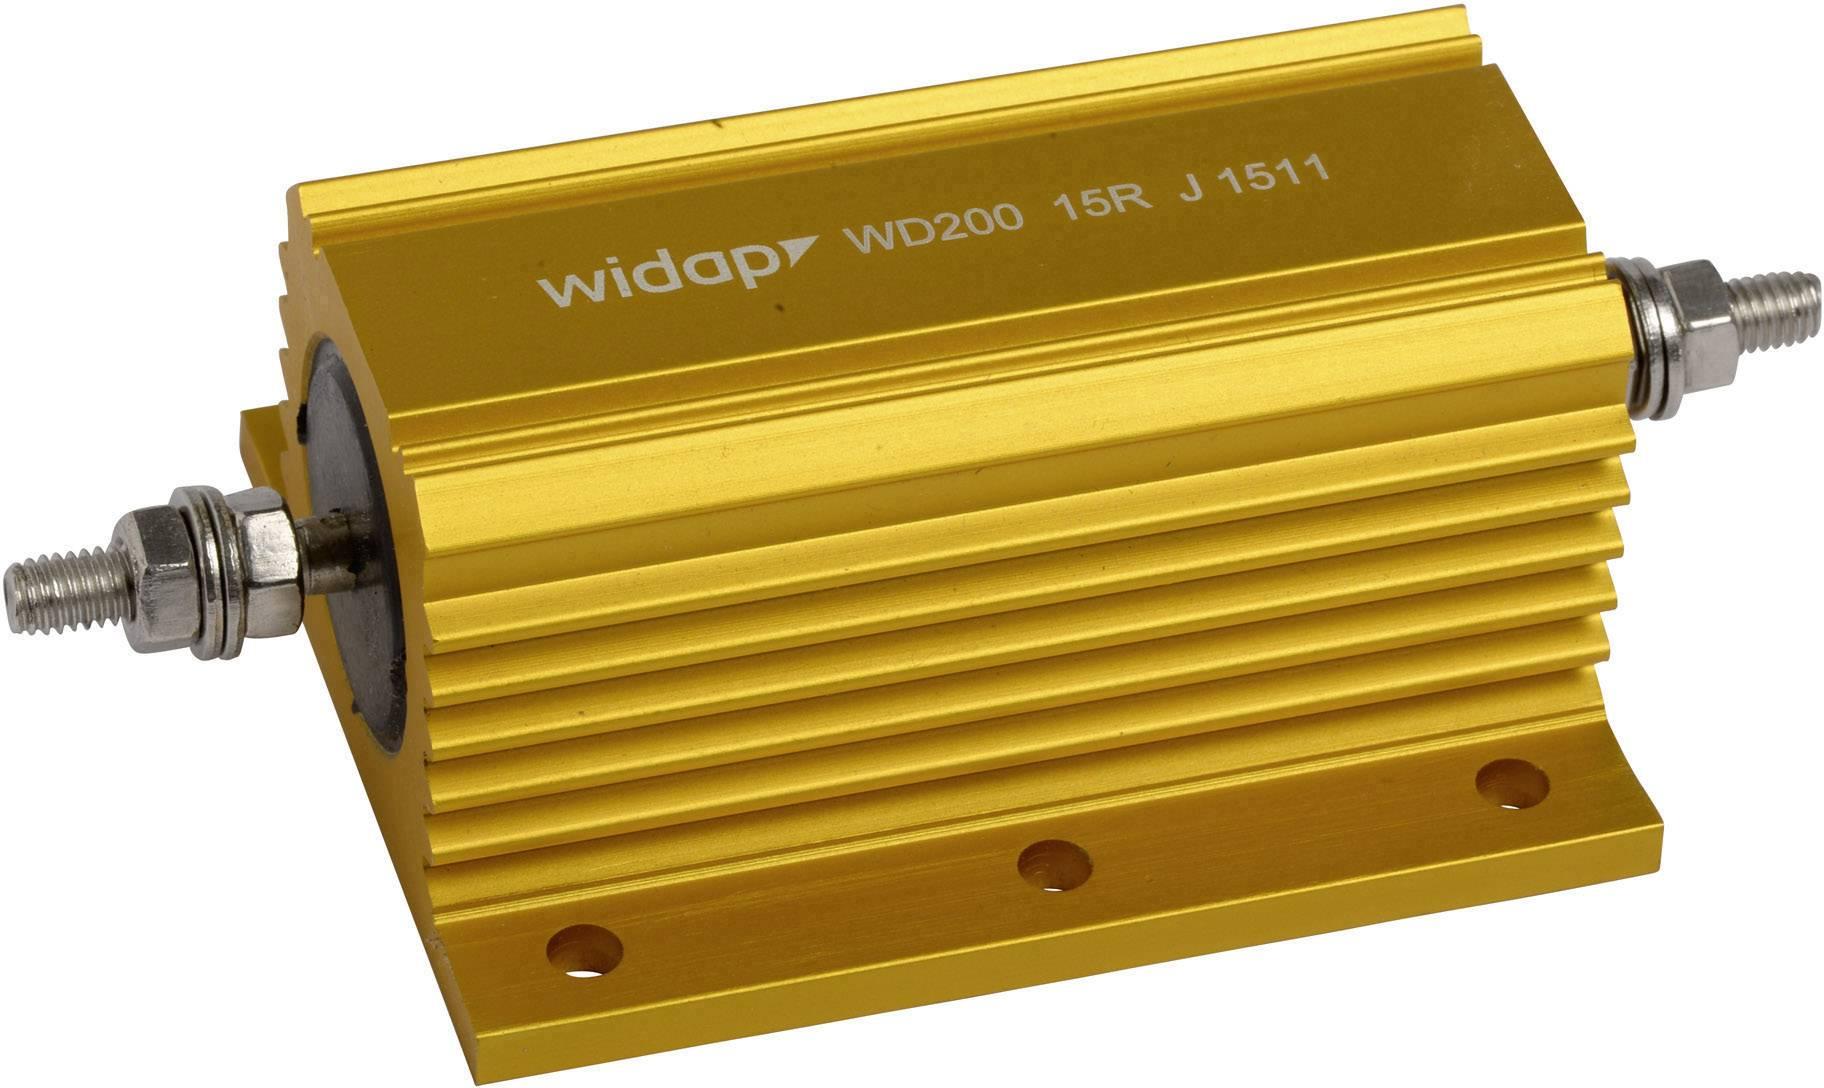 Drôtový rezistor Widap 160173, hodnota odporu 10 Ohm, 300 W, 1 ks